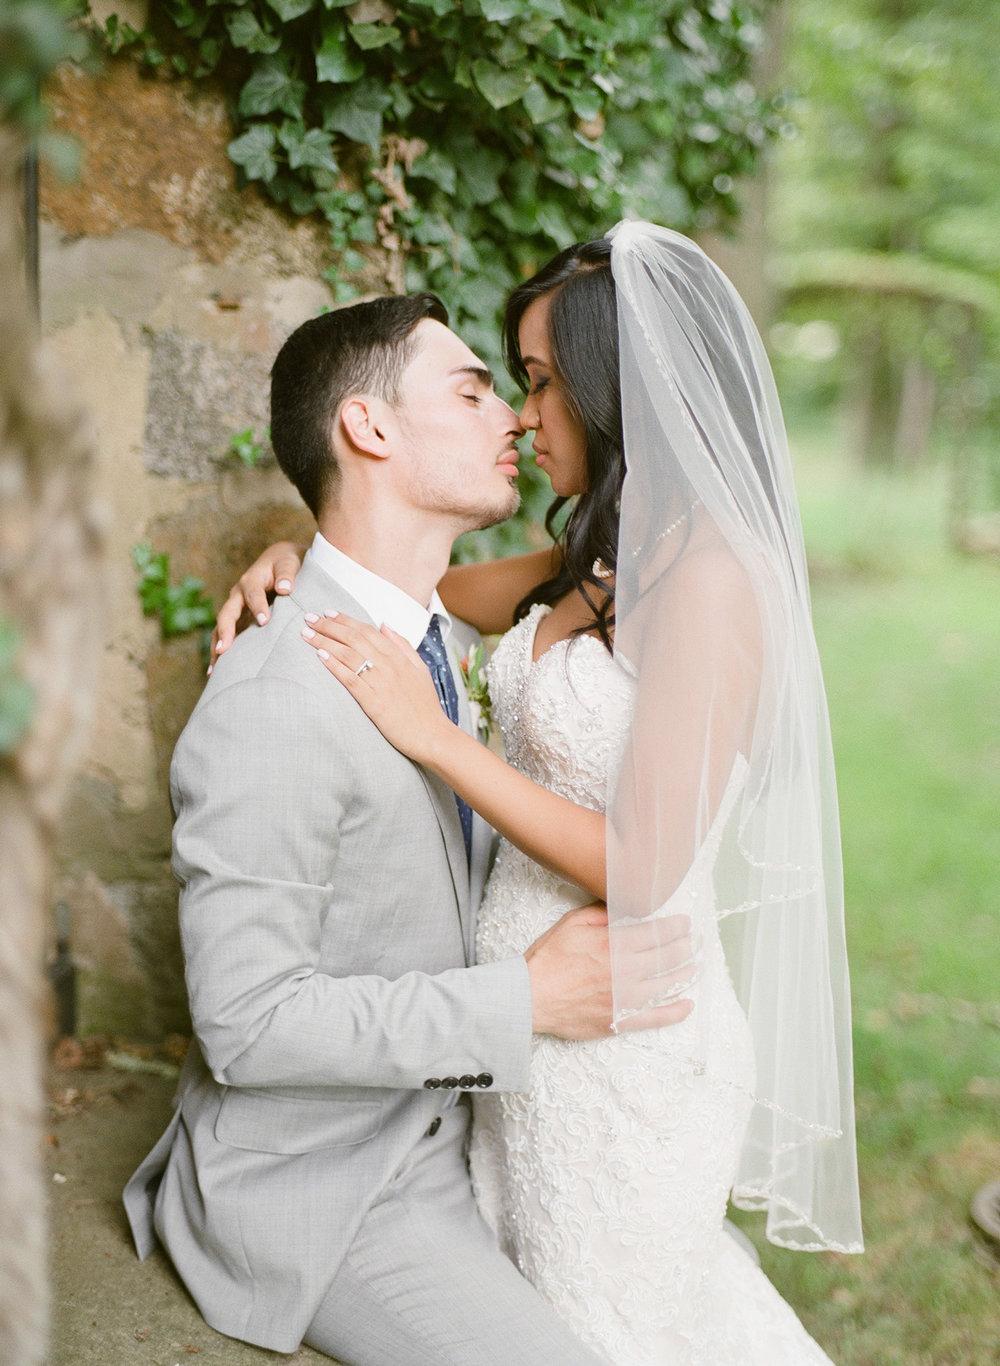 Virginia-Film-Photographer-Wedding-35.jpg